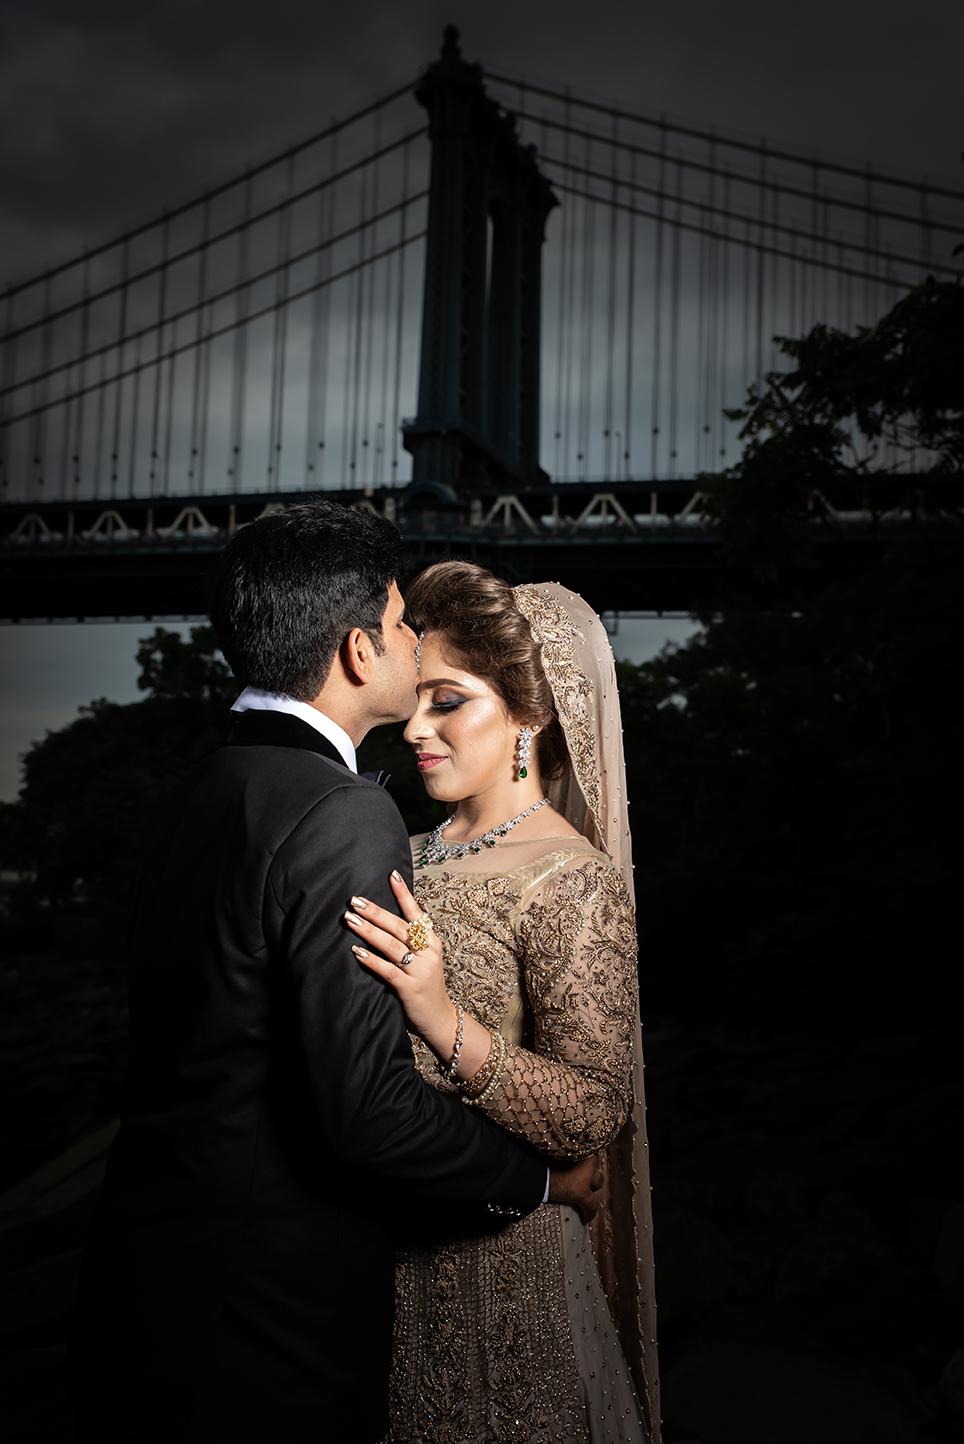 south_asian_wedding_photography_dhoom_studio_new_york73 SOUTH ASIAN WEDDINGS